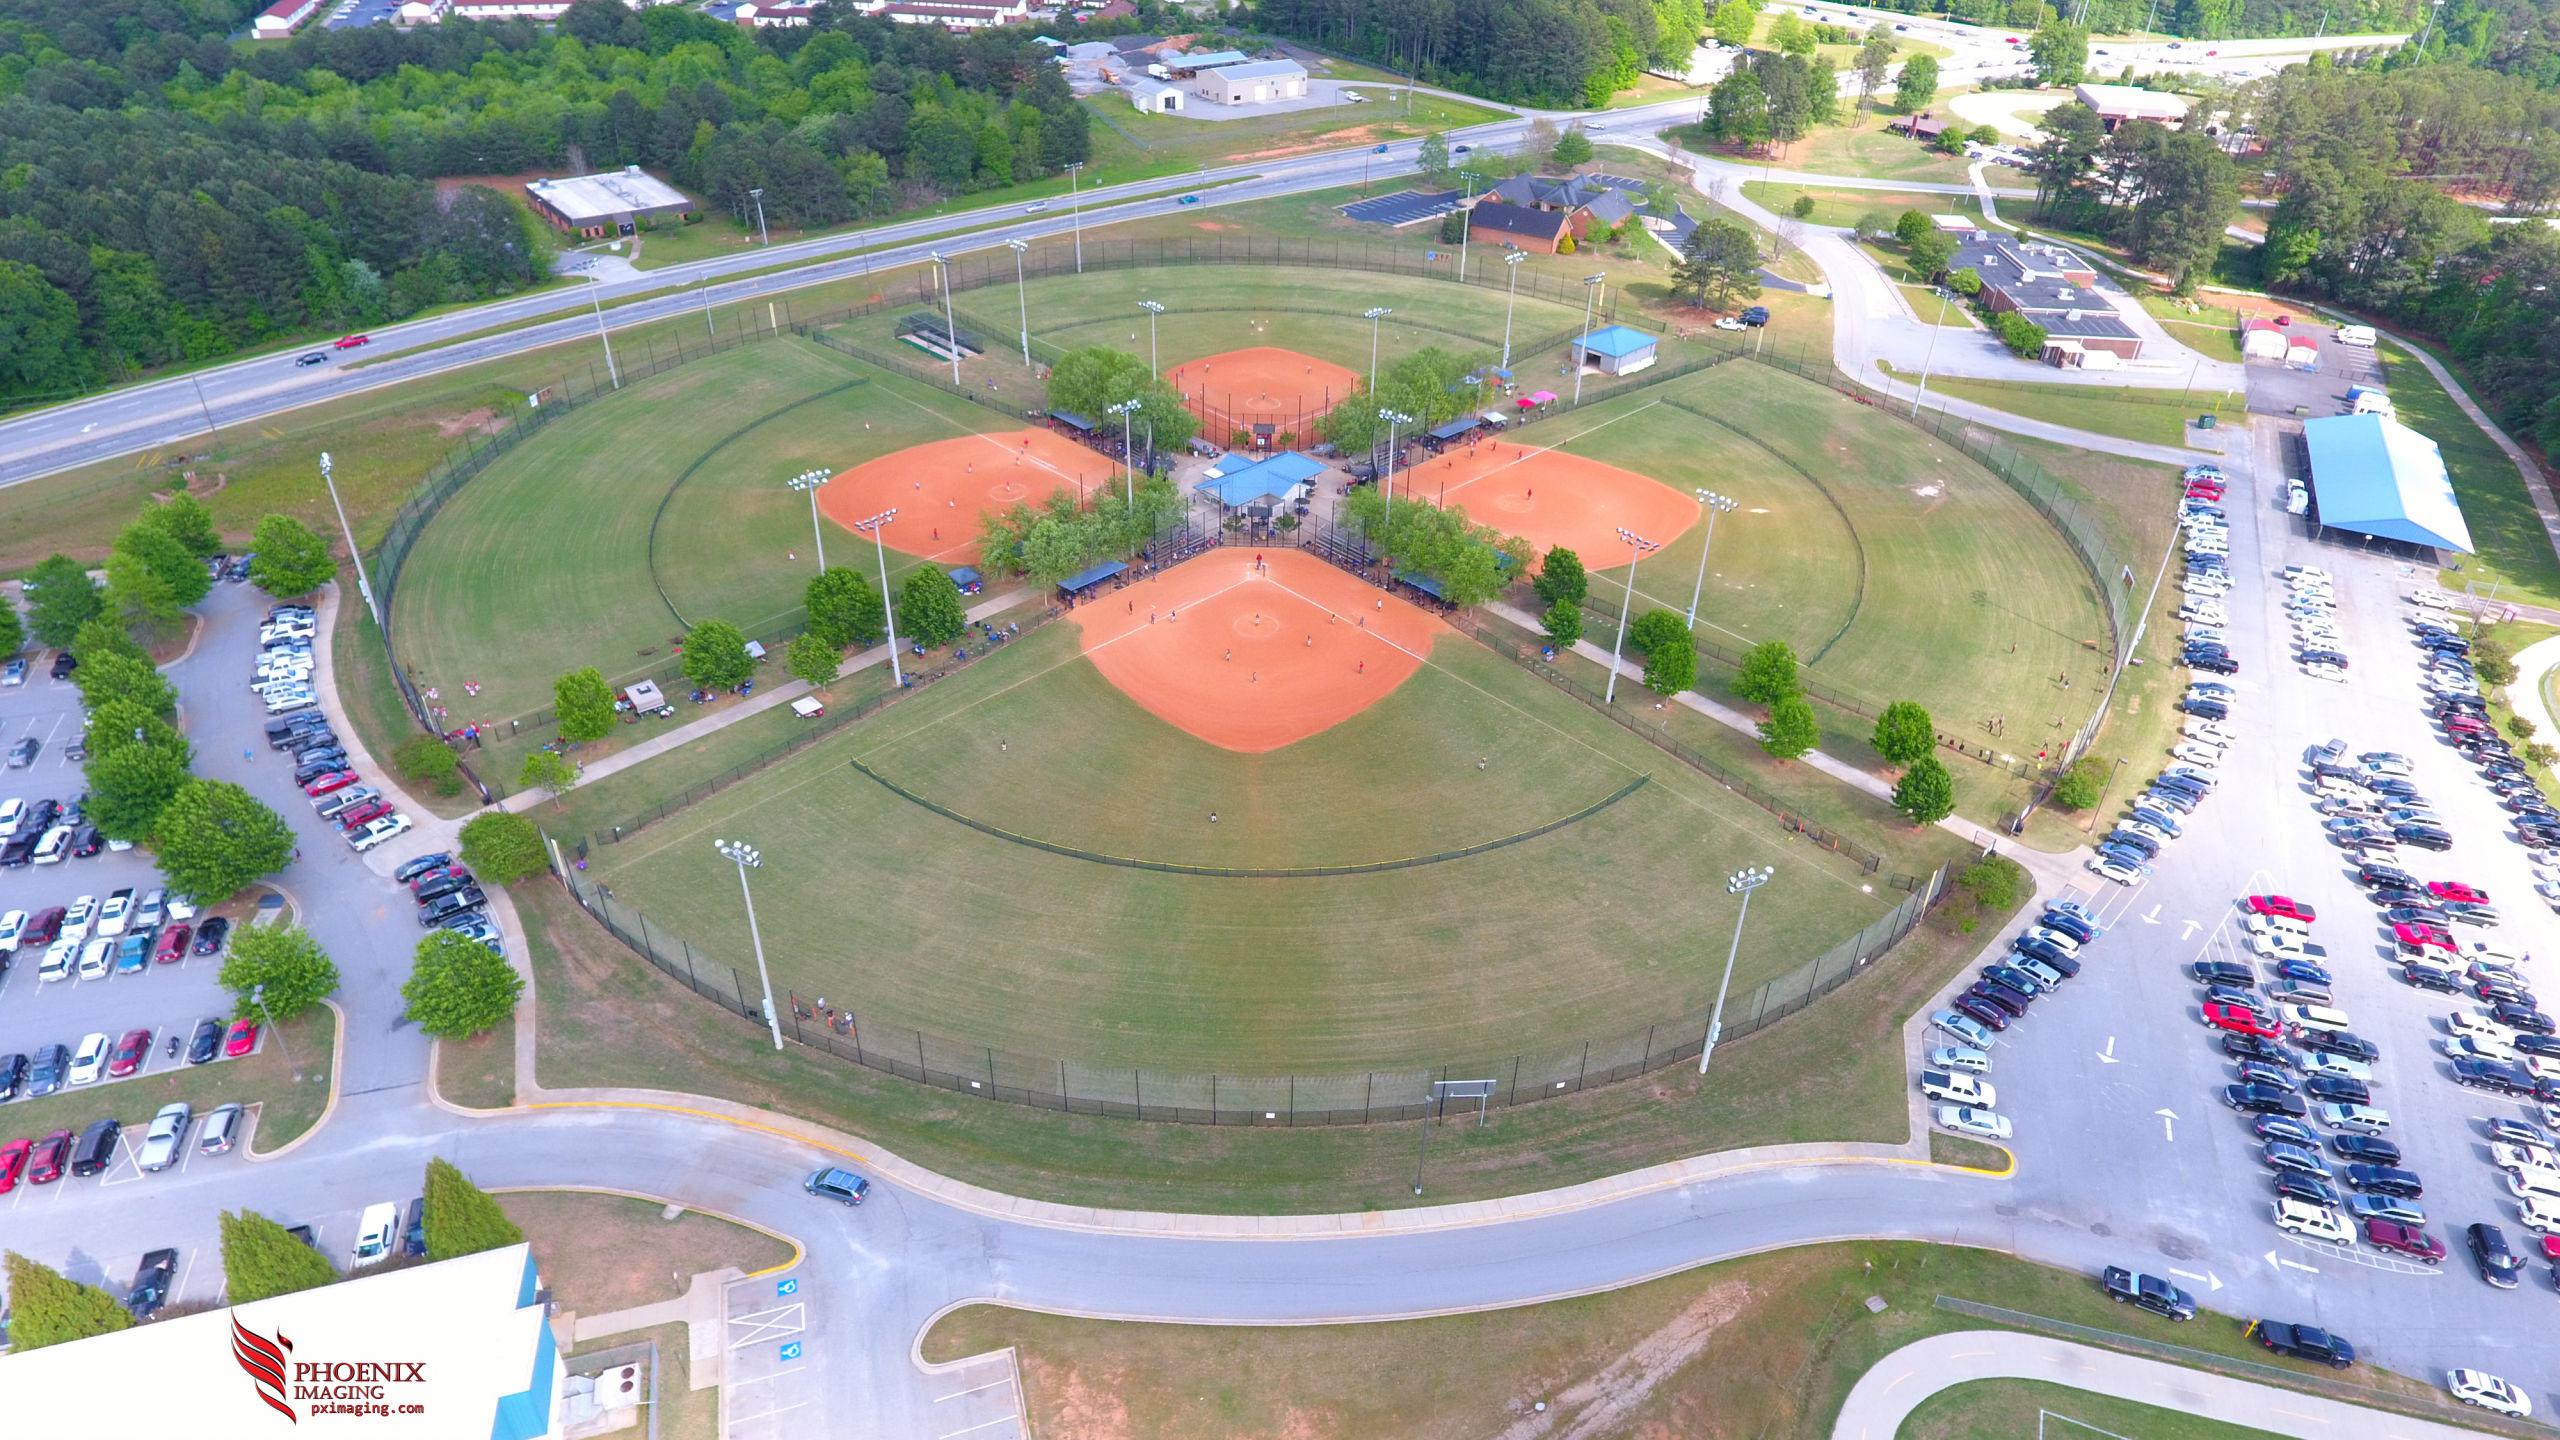 Let's play ball in Carrollton!